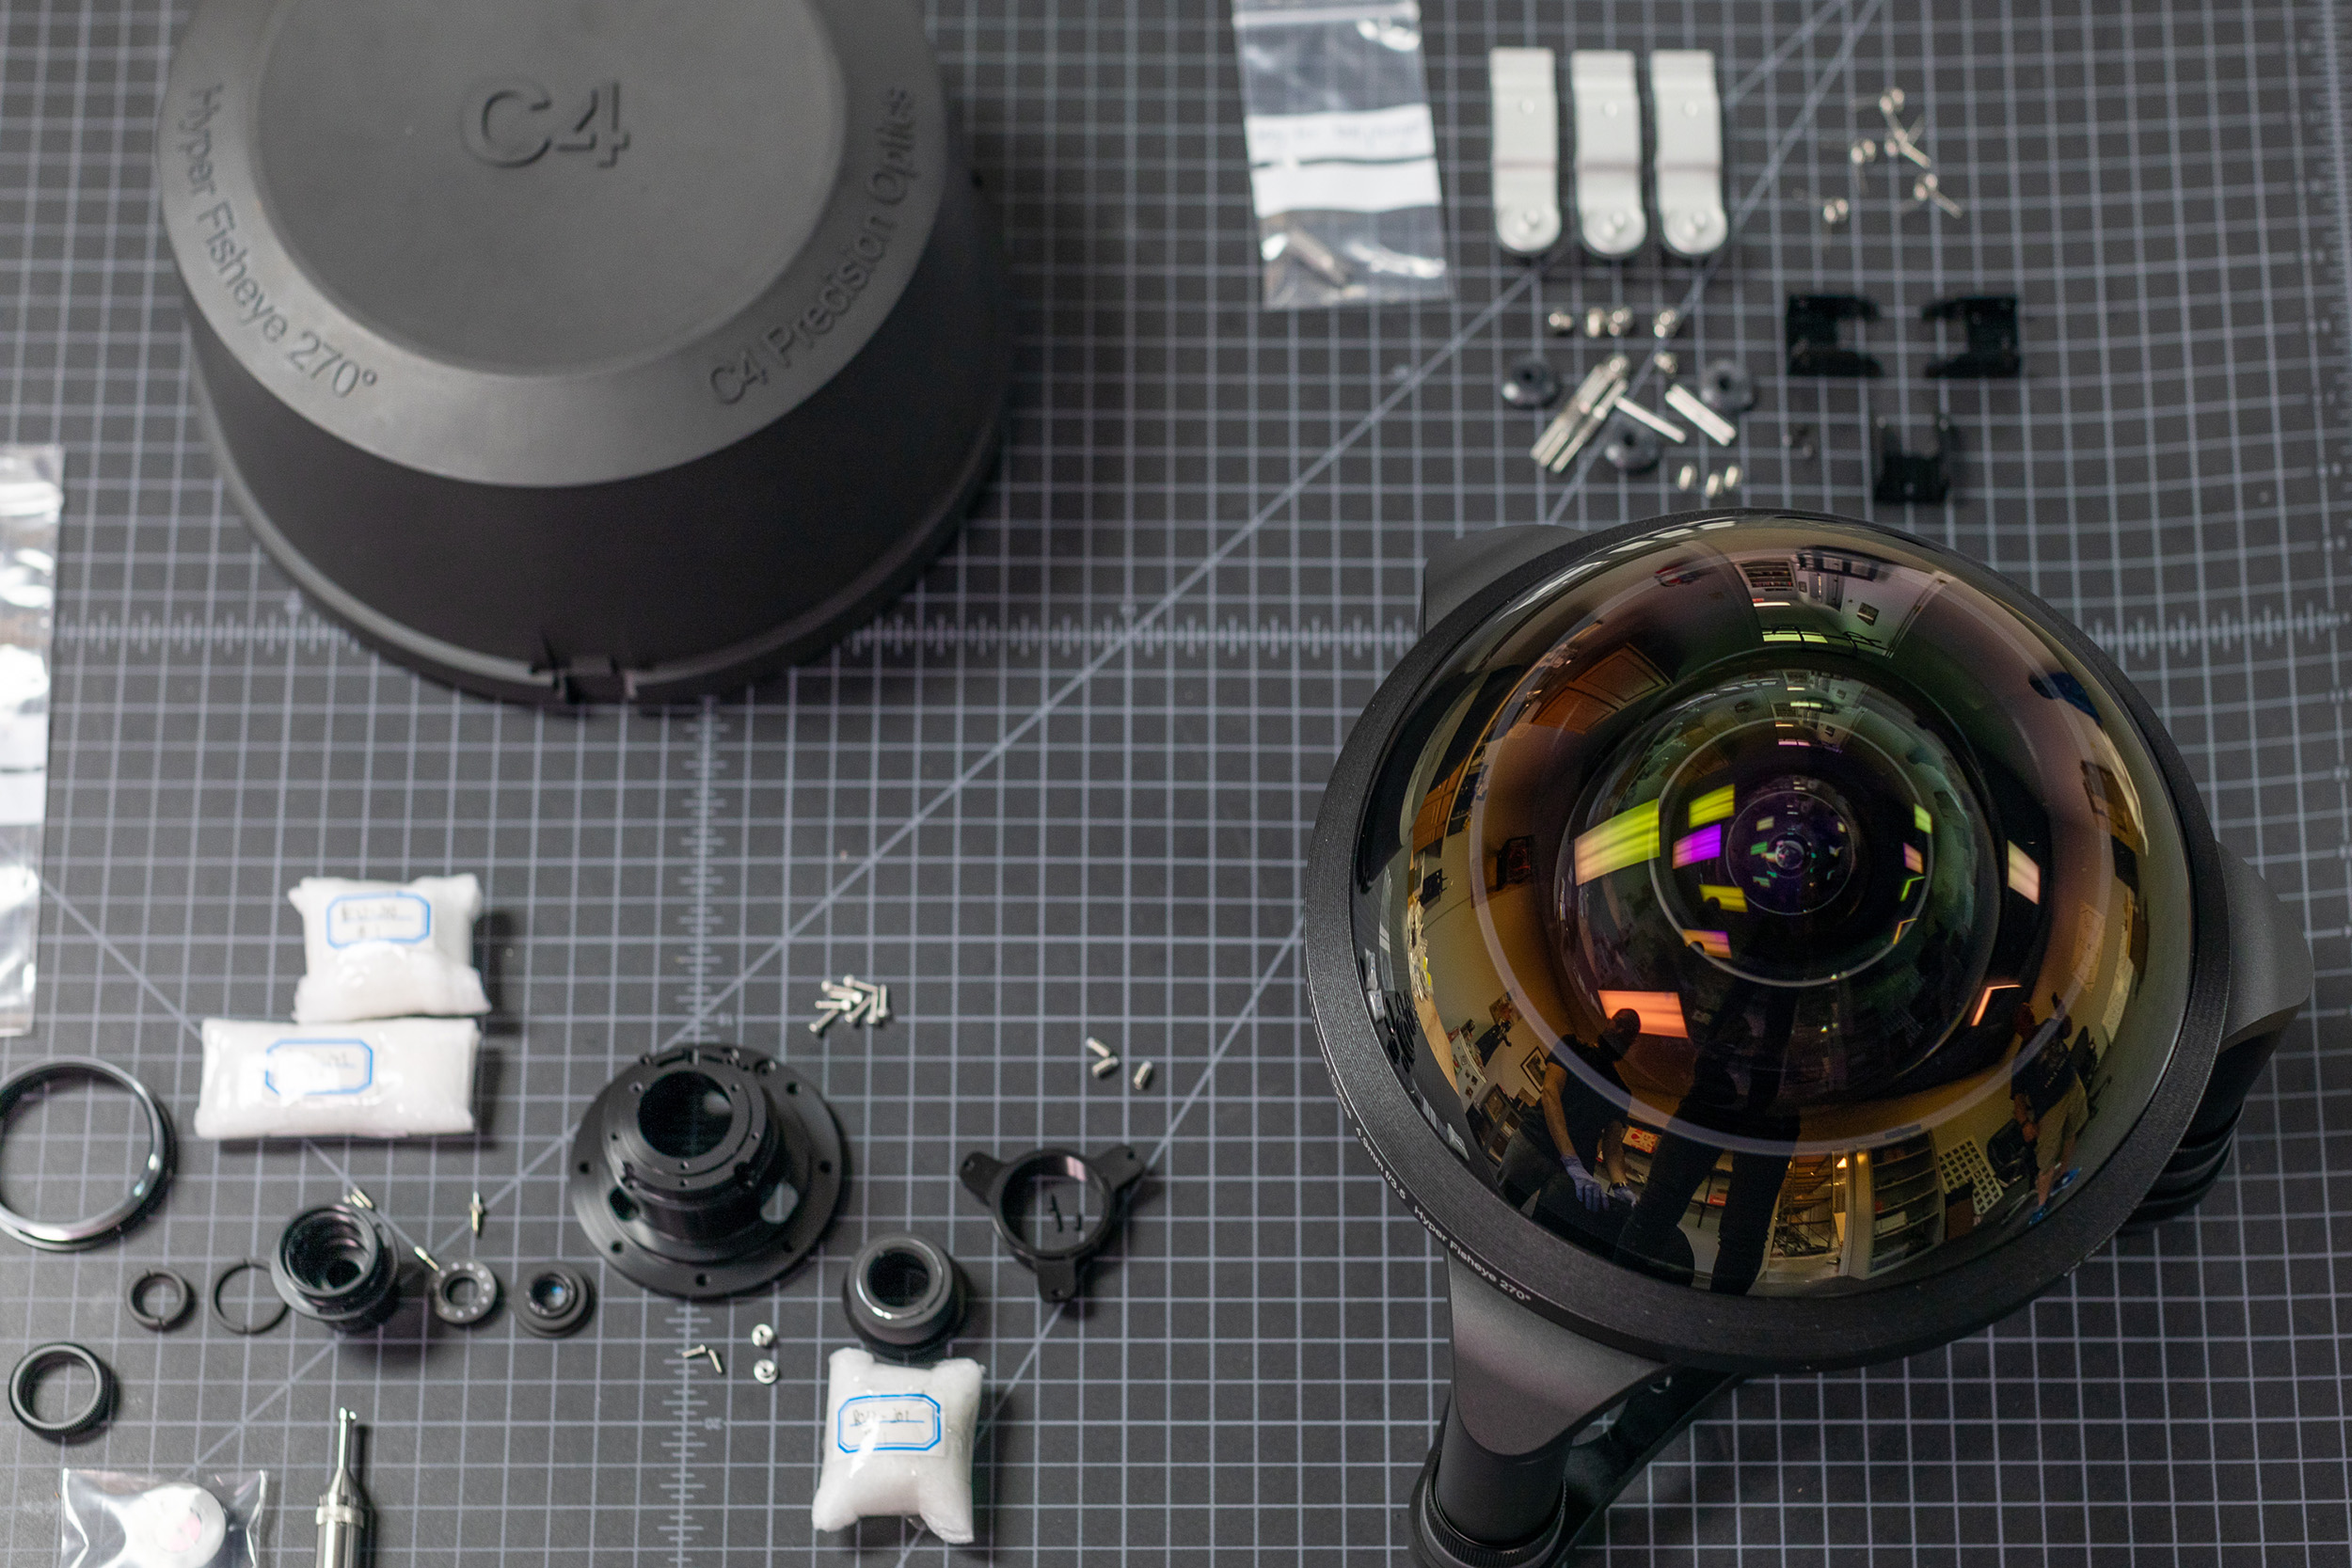 C-4 Fisheye Lens